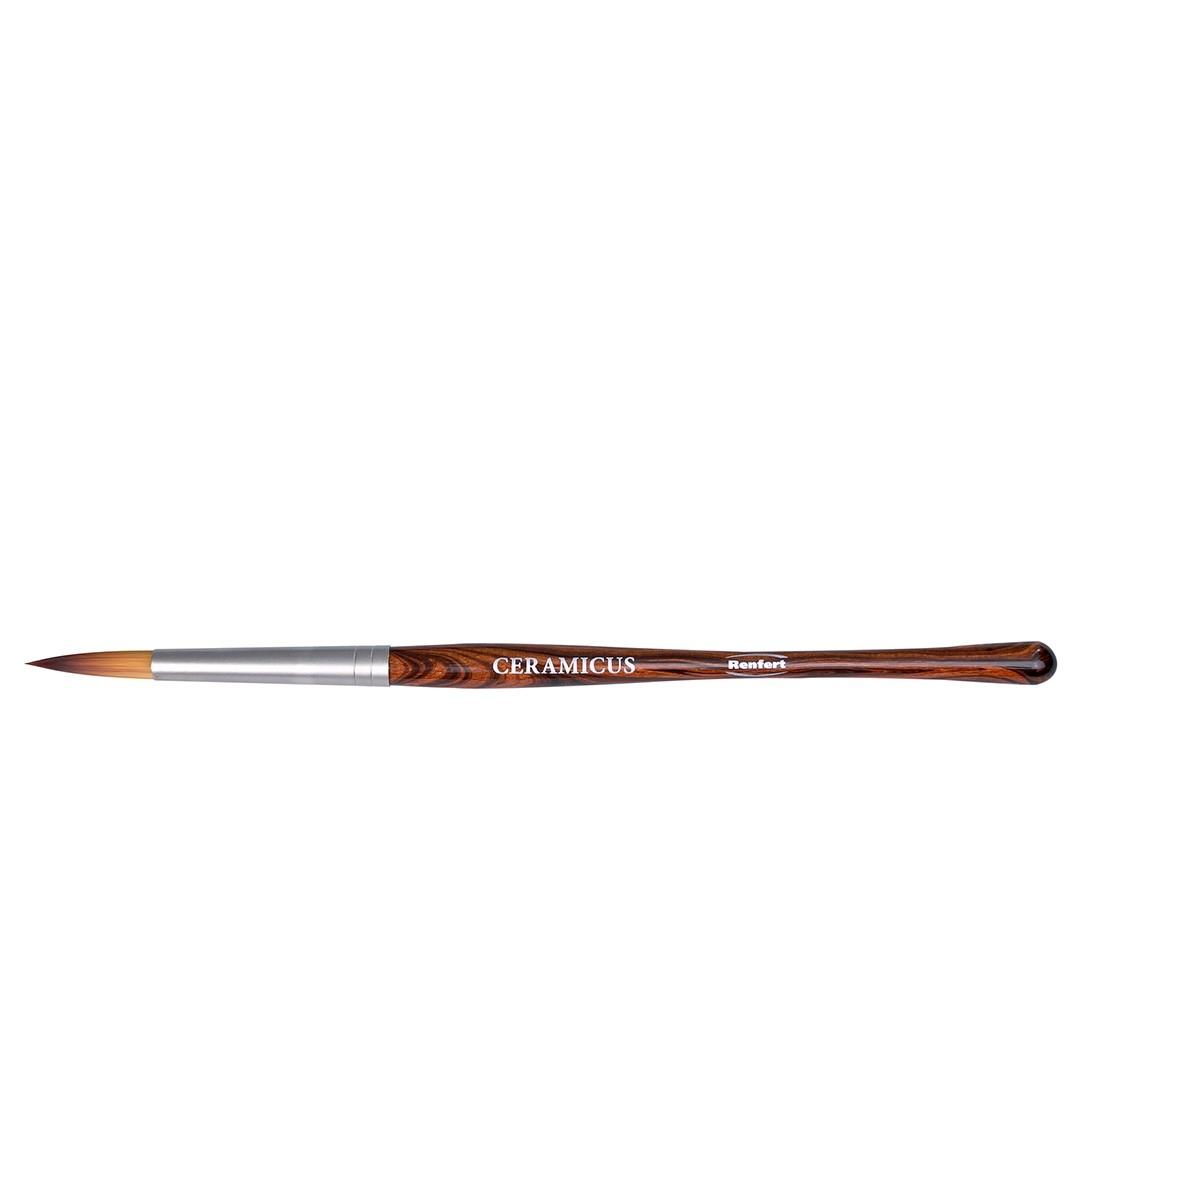 Pincel Renfert Ceramicus Microestrurura Sintética especial N.8 - Ref 1716-0008